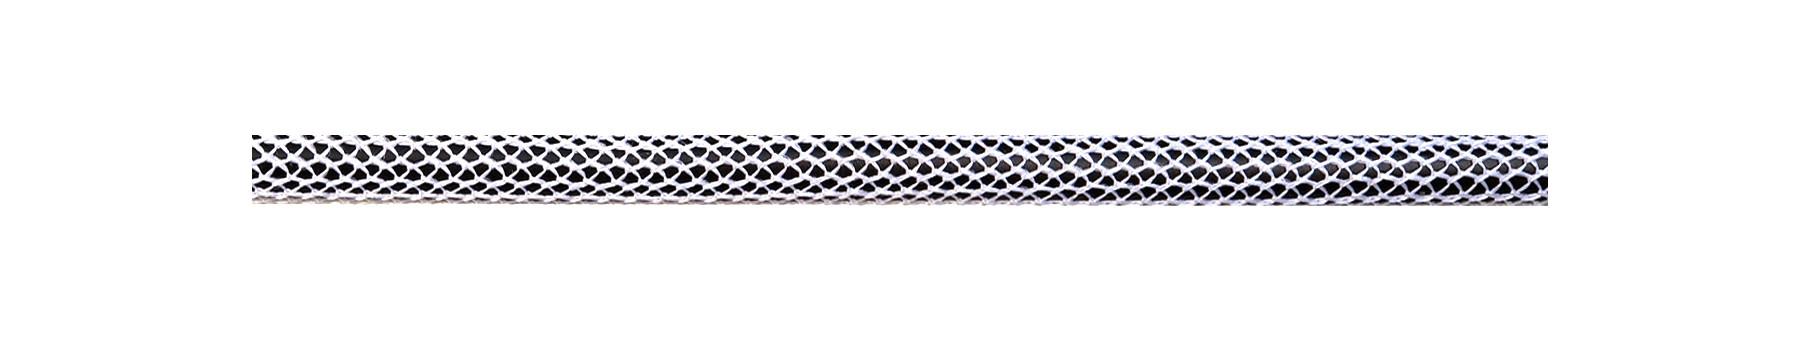 Textile Cable Shiny White-Black Netlike Textile Covering